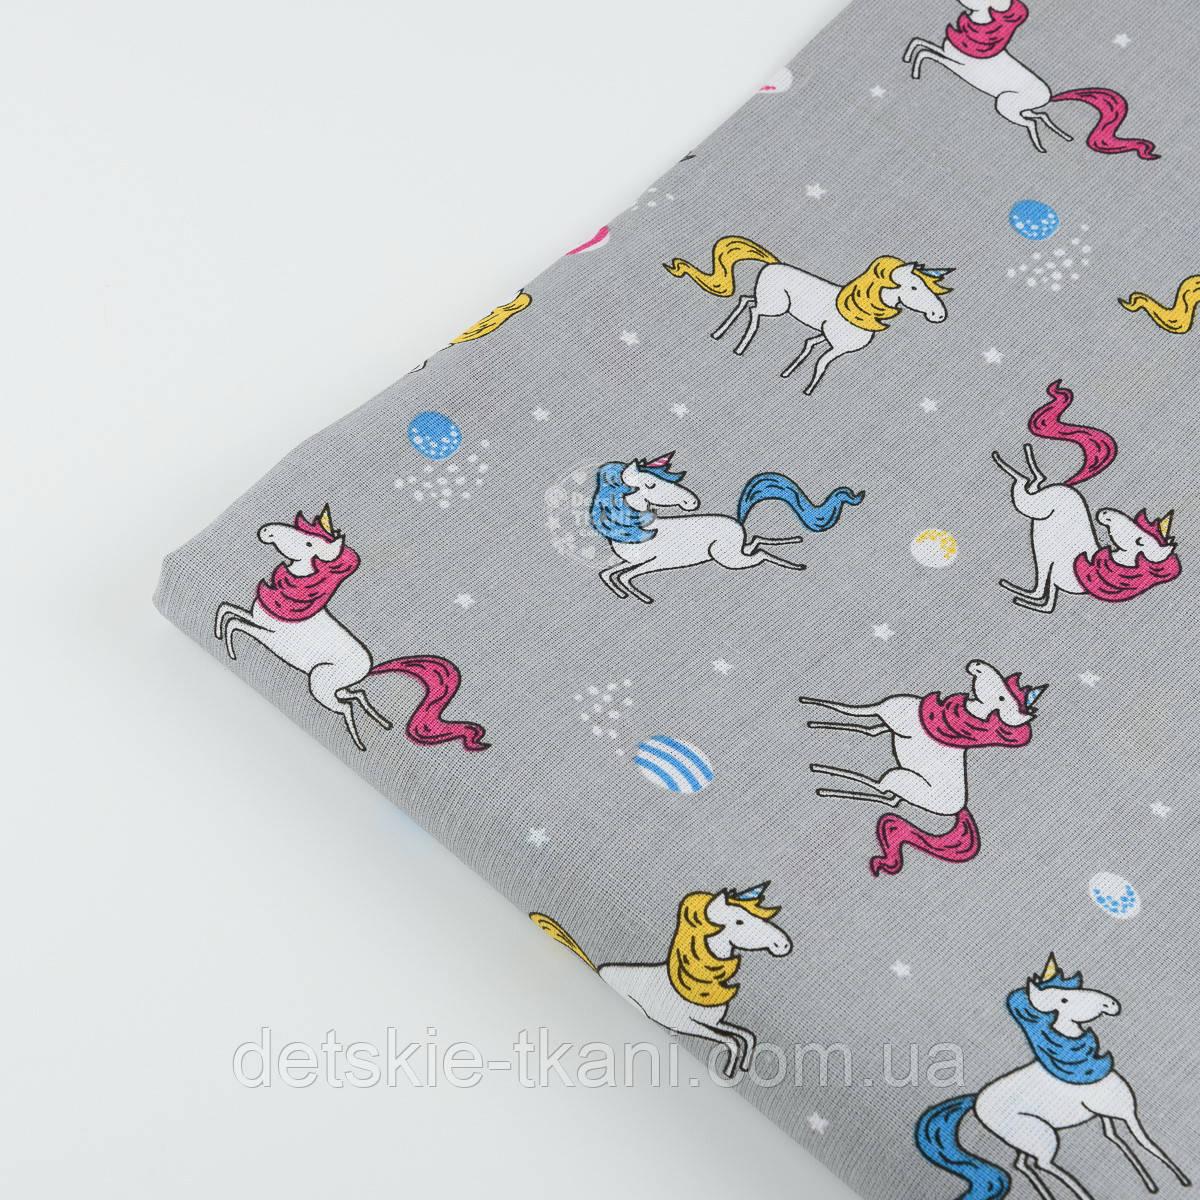 Лоскут ткани №706 размером 37*80 см